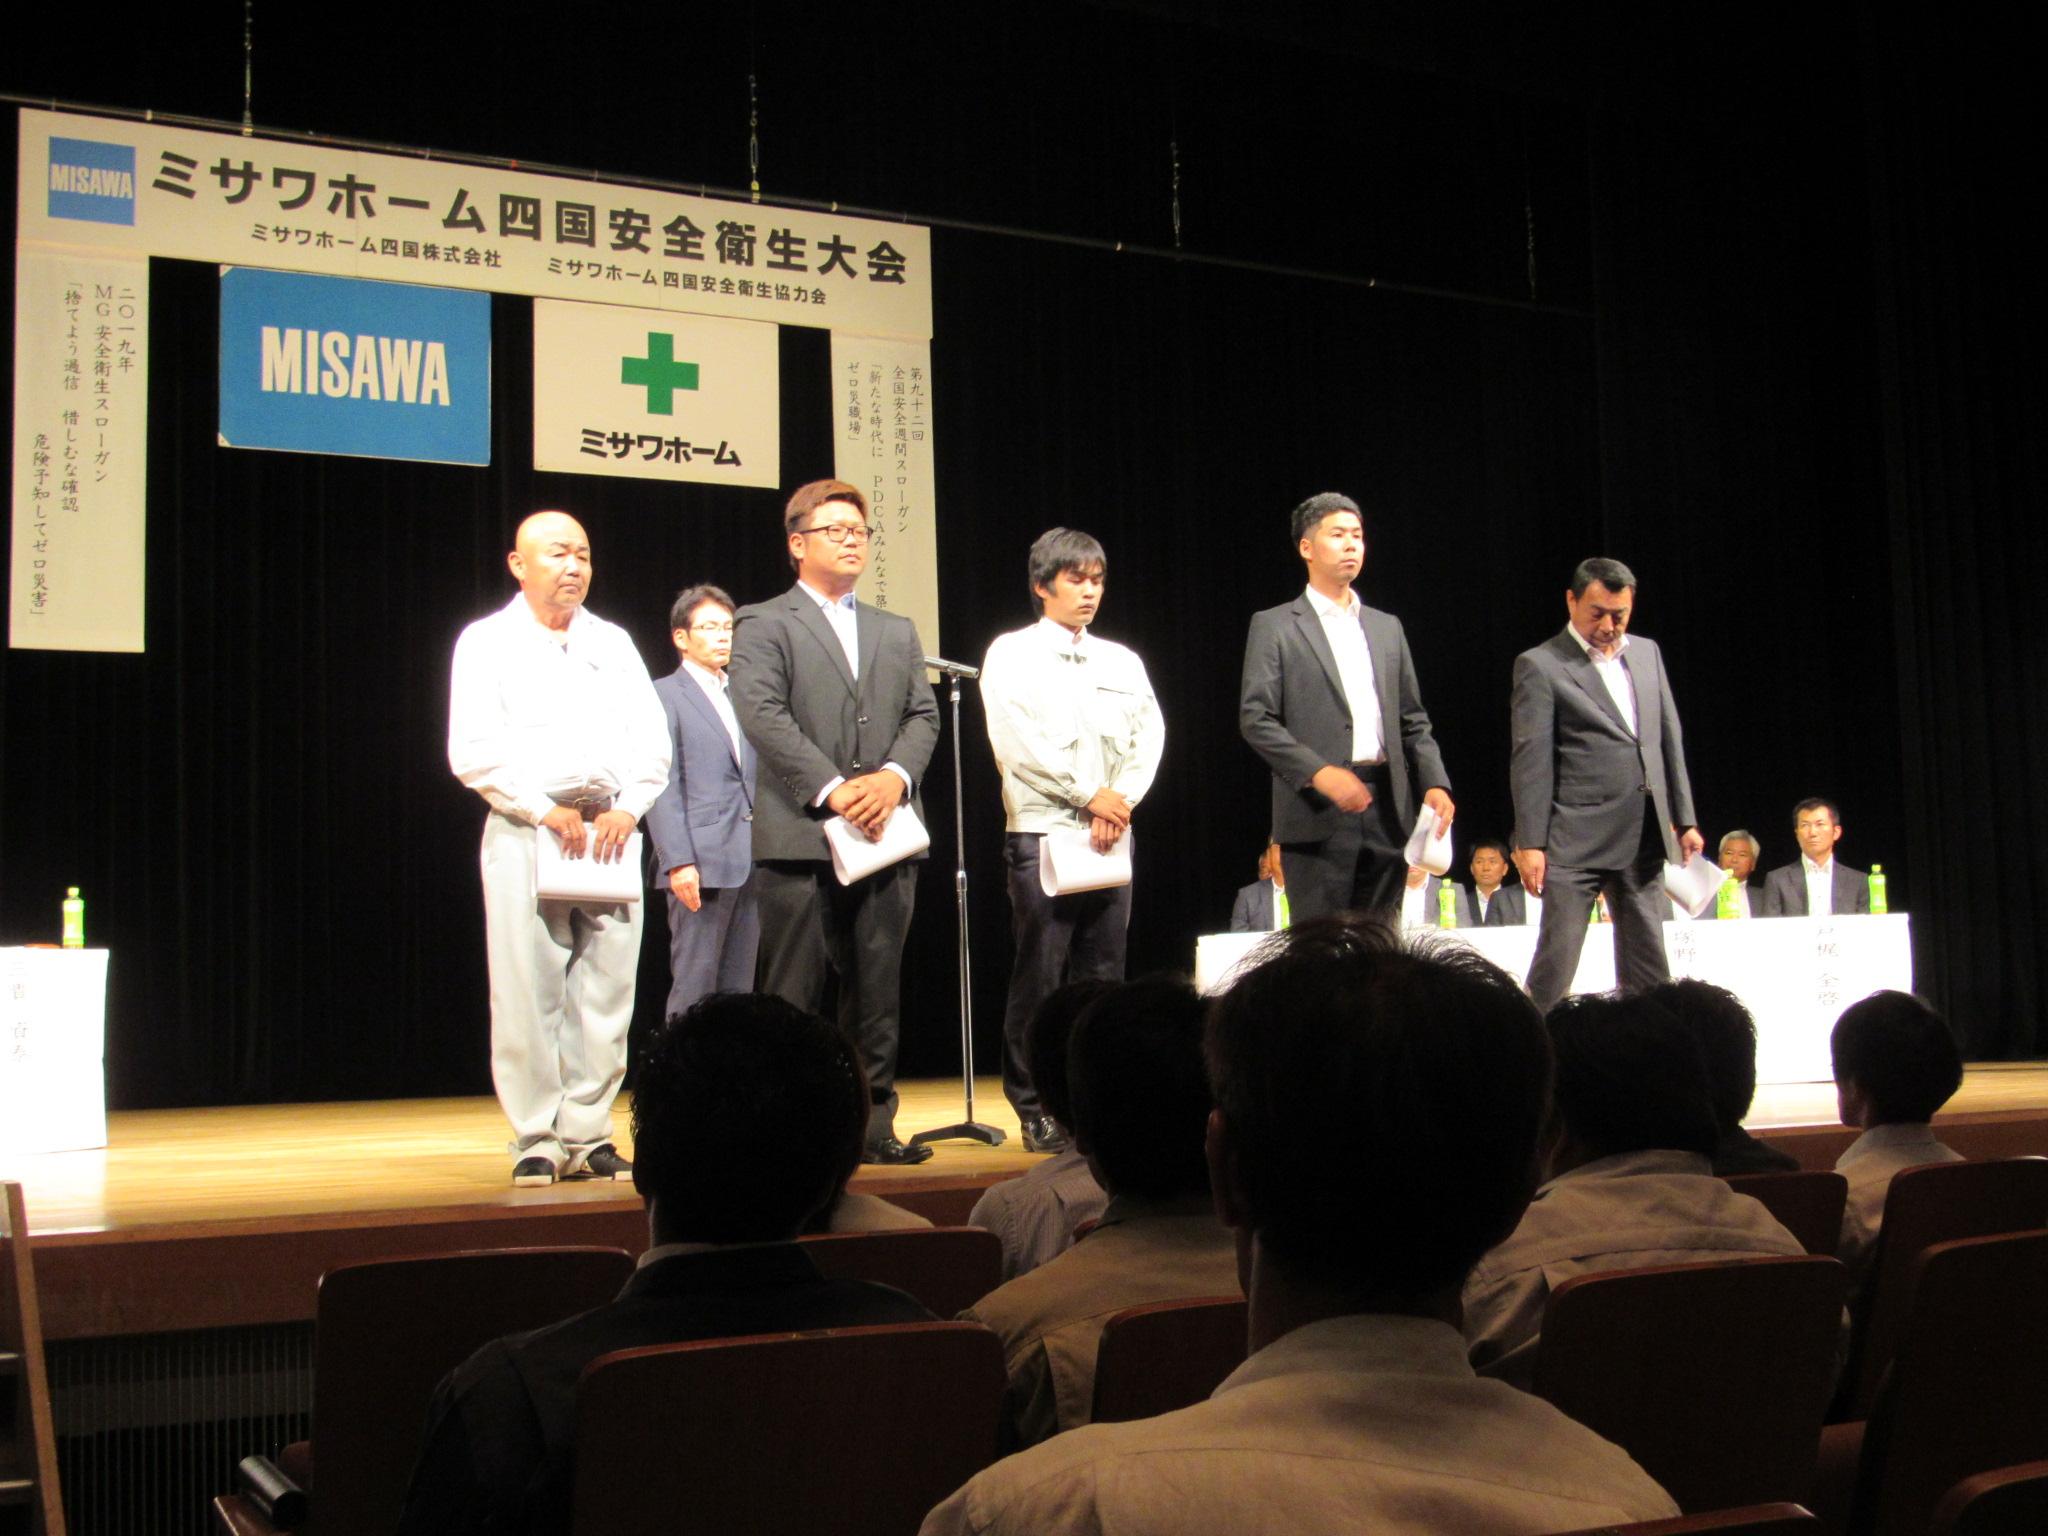 http://shikoku.misawa.co.jp/blg_ms/IMG_7786.JPG